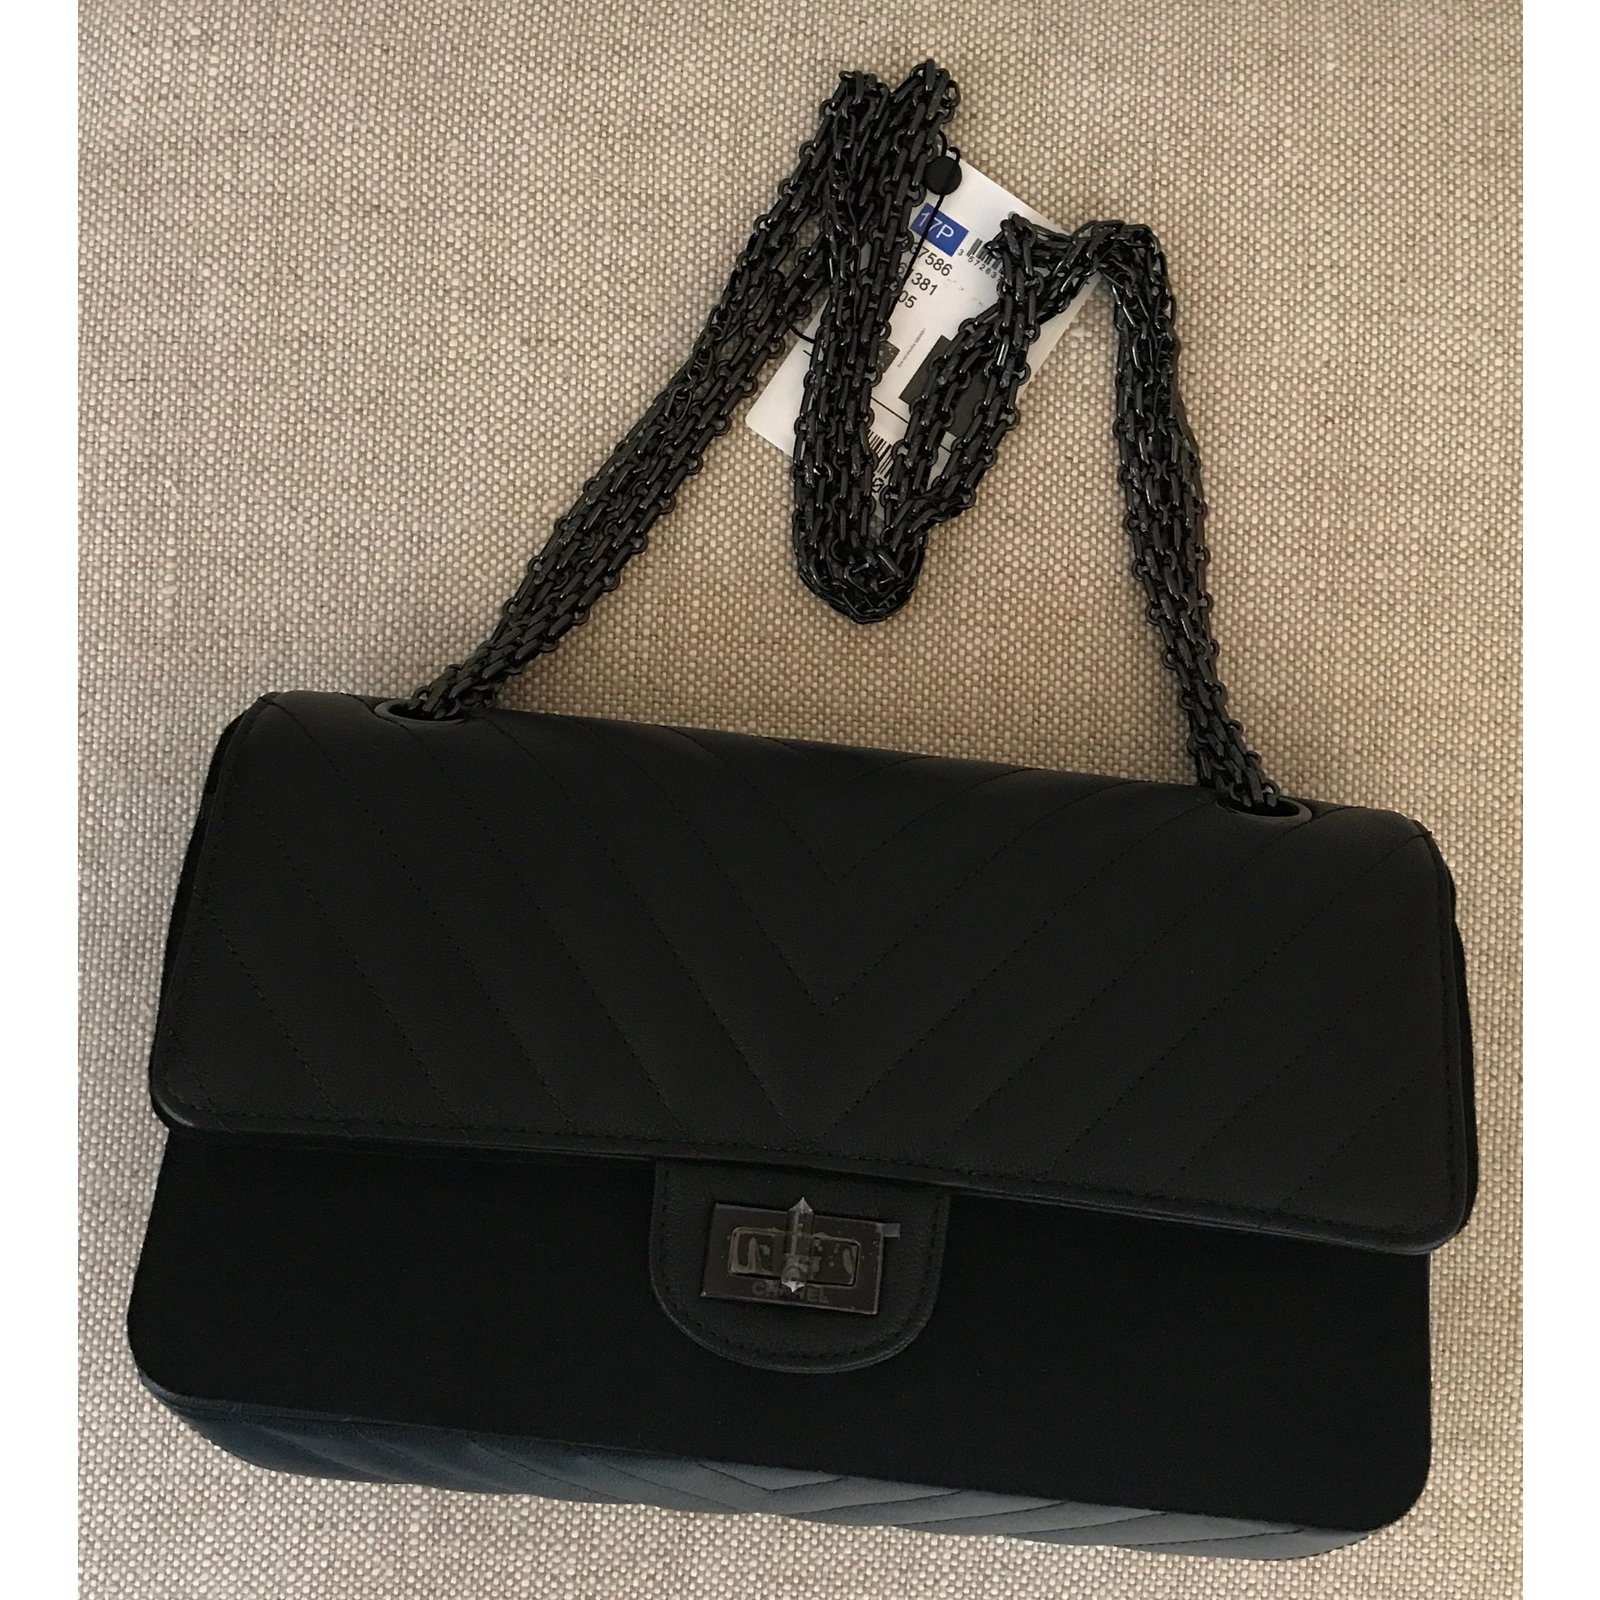 787d19334adb Chanel So Black Reissue Chevron 2.55 Double Flap Handbag Limited Edition  Handbags Leather Black ref.65212 - Joli Closet